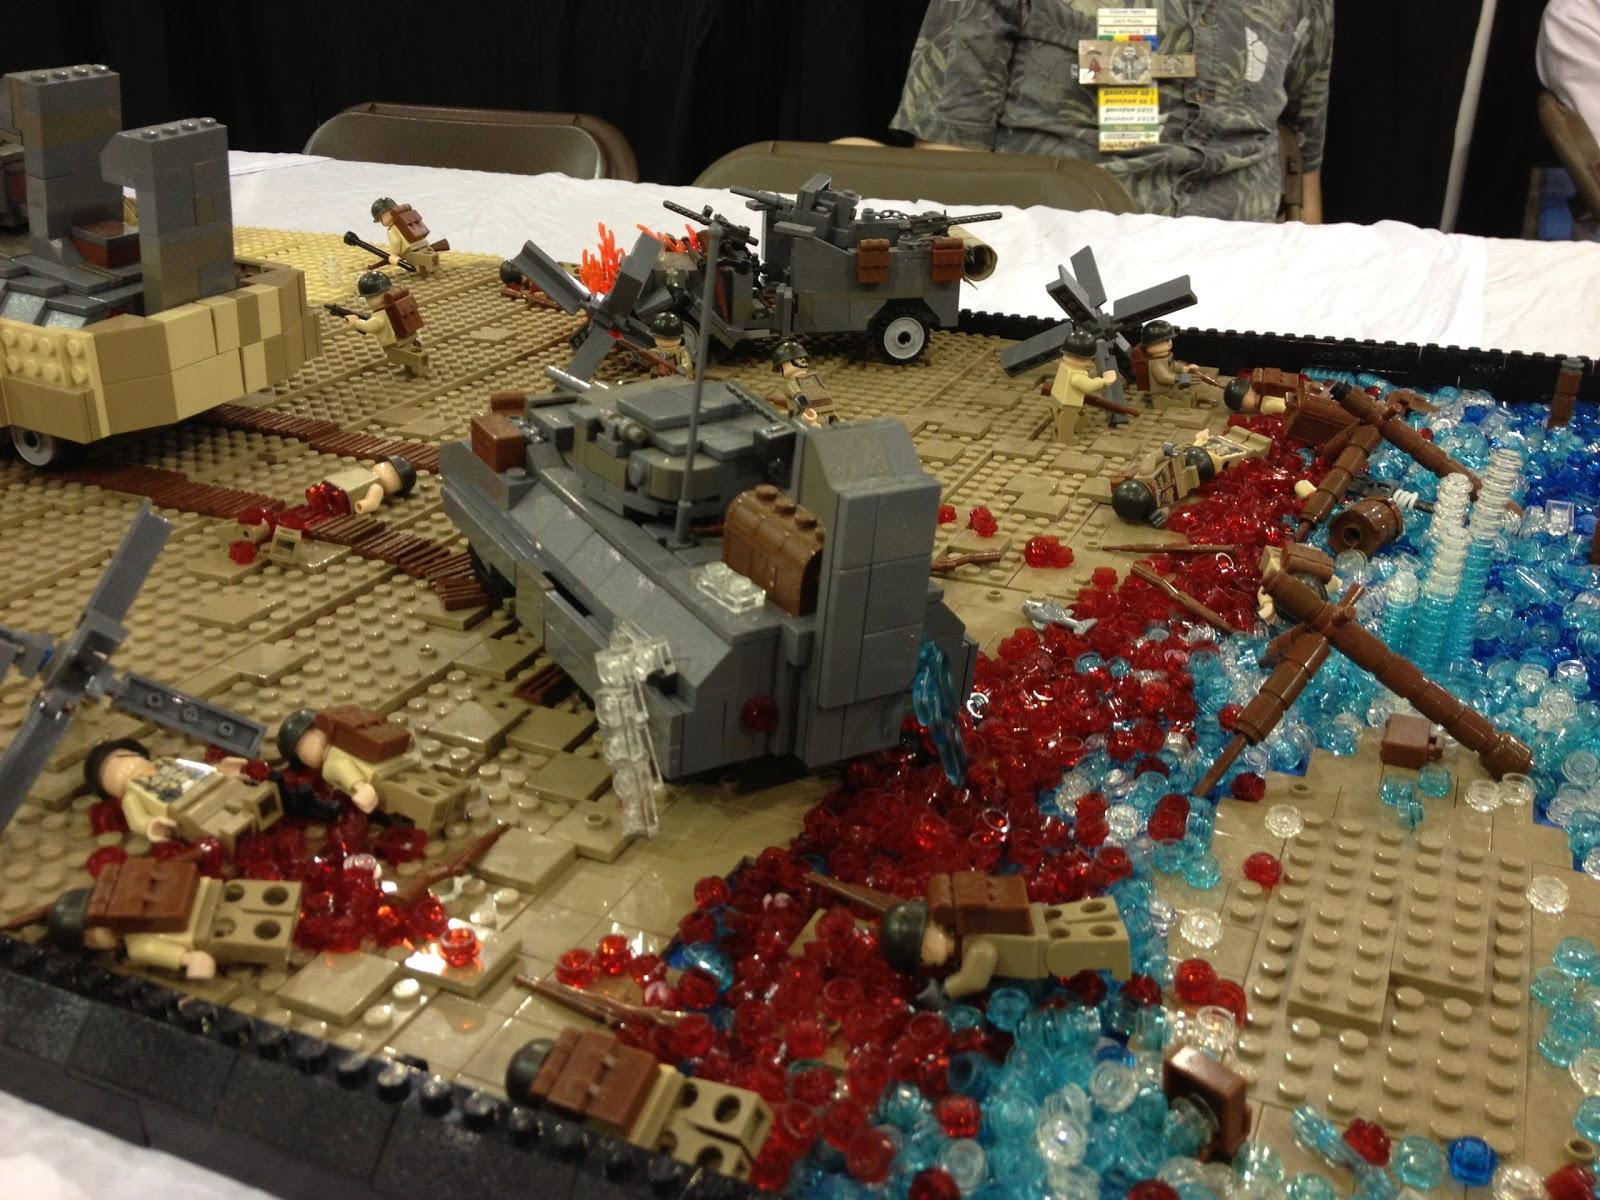 1000 Foot General: LEGO Goes to War: Brickfest 2013